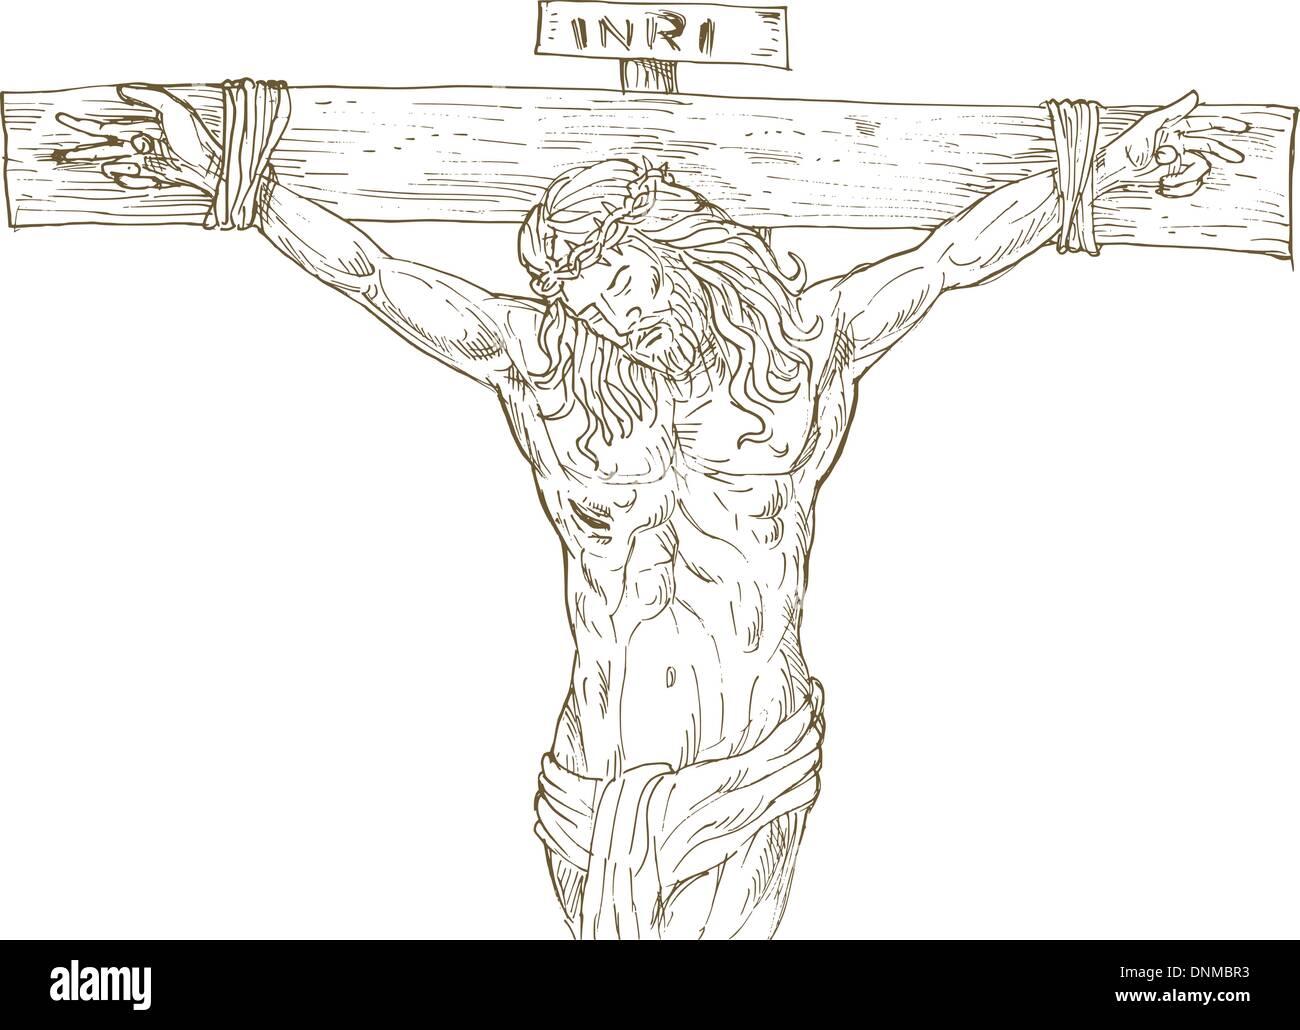 hand drawn illustration of jesus christ hanging on the cross stock